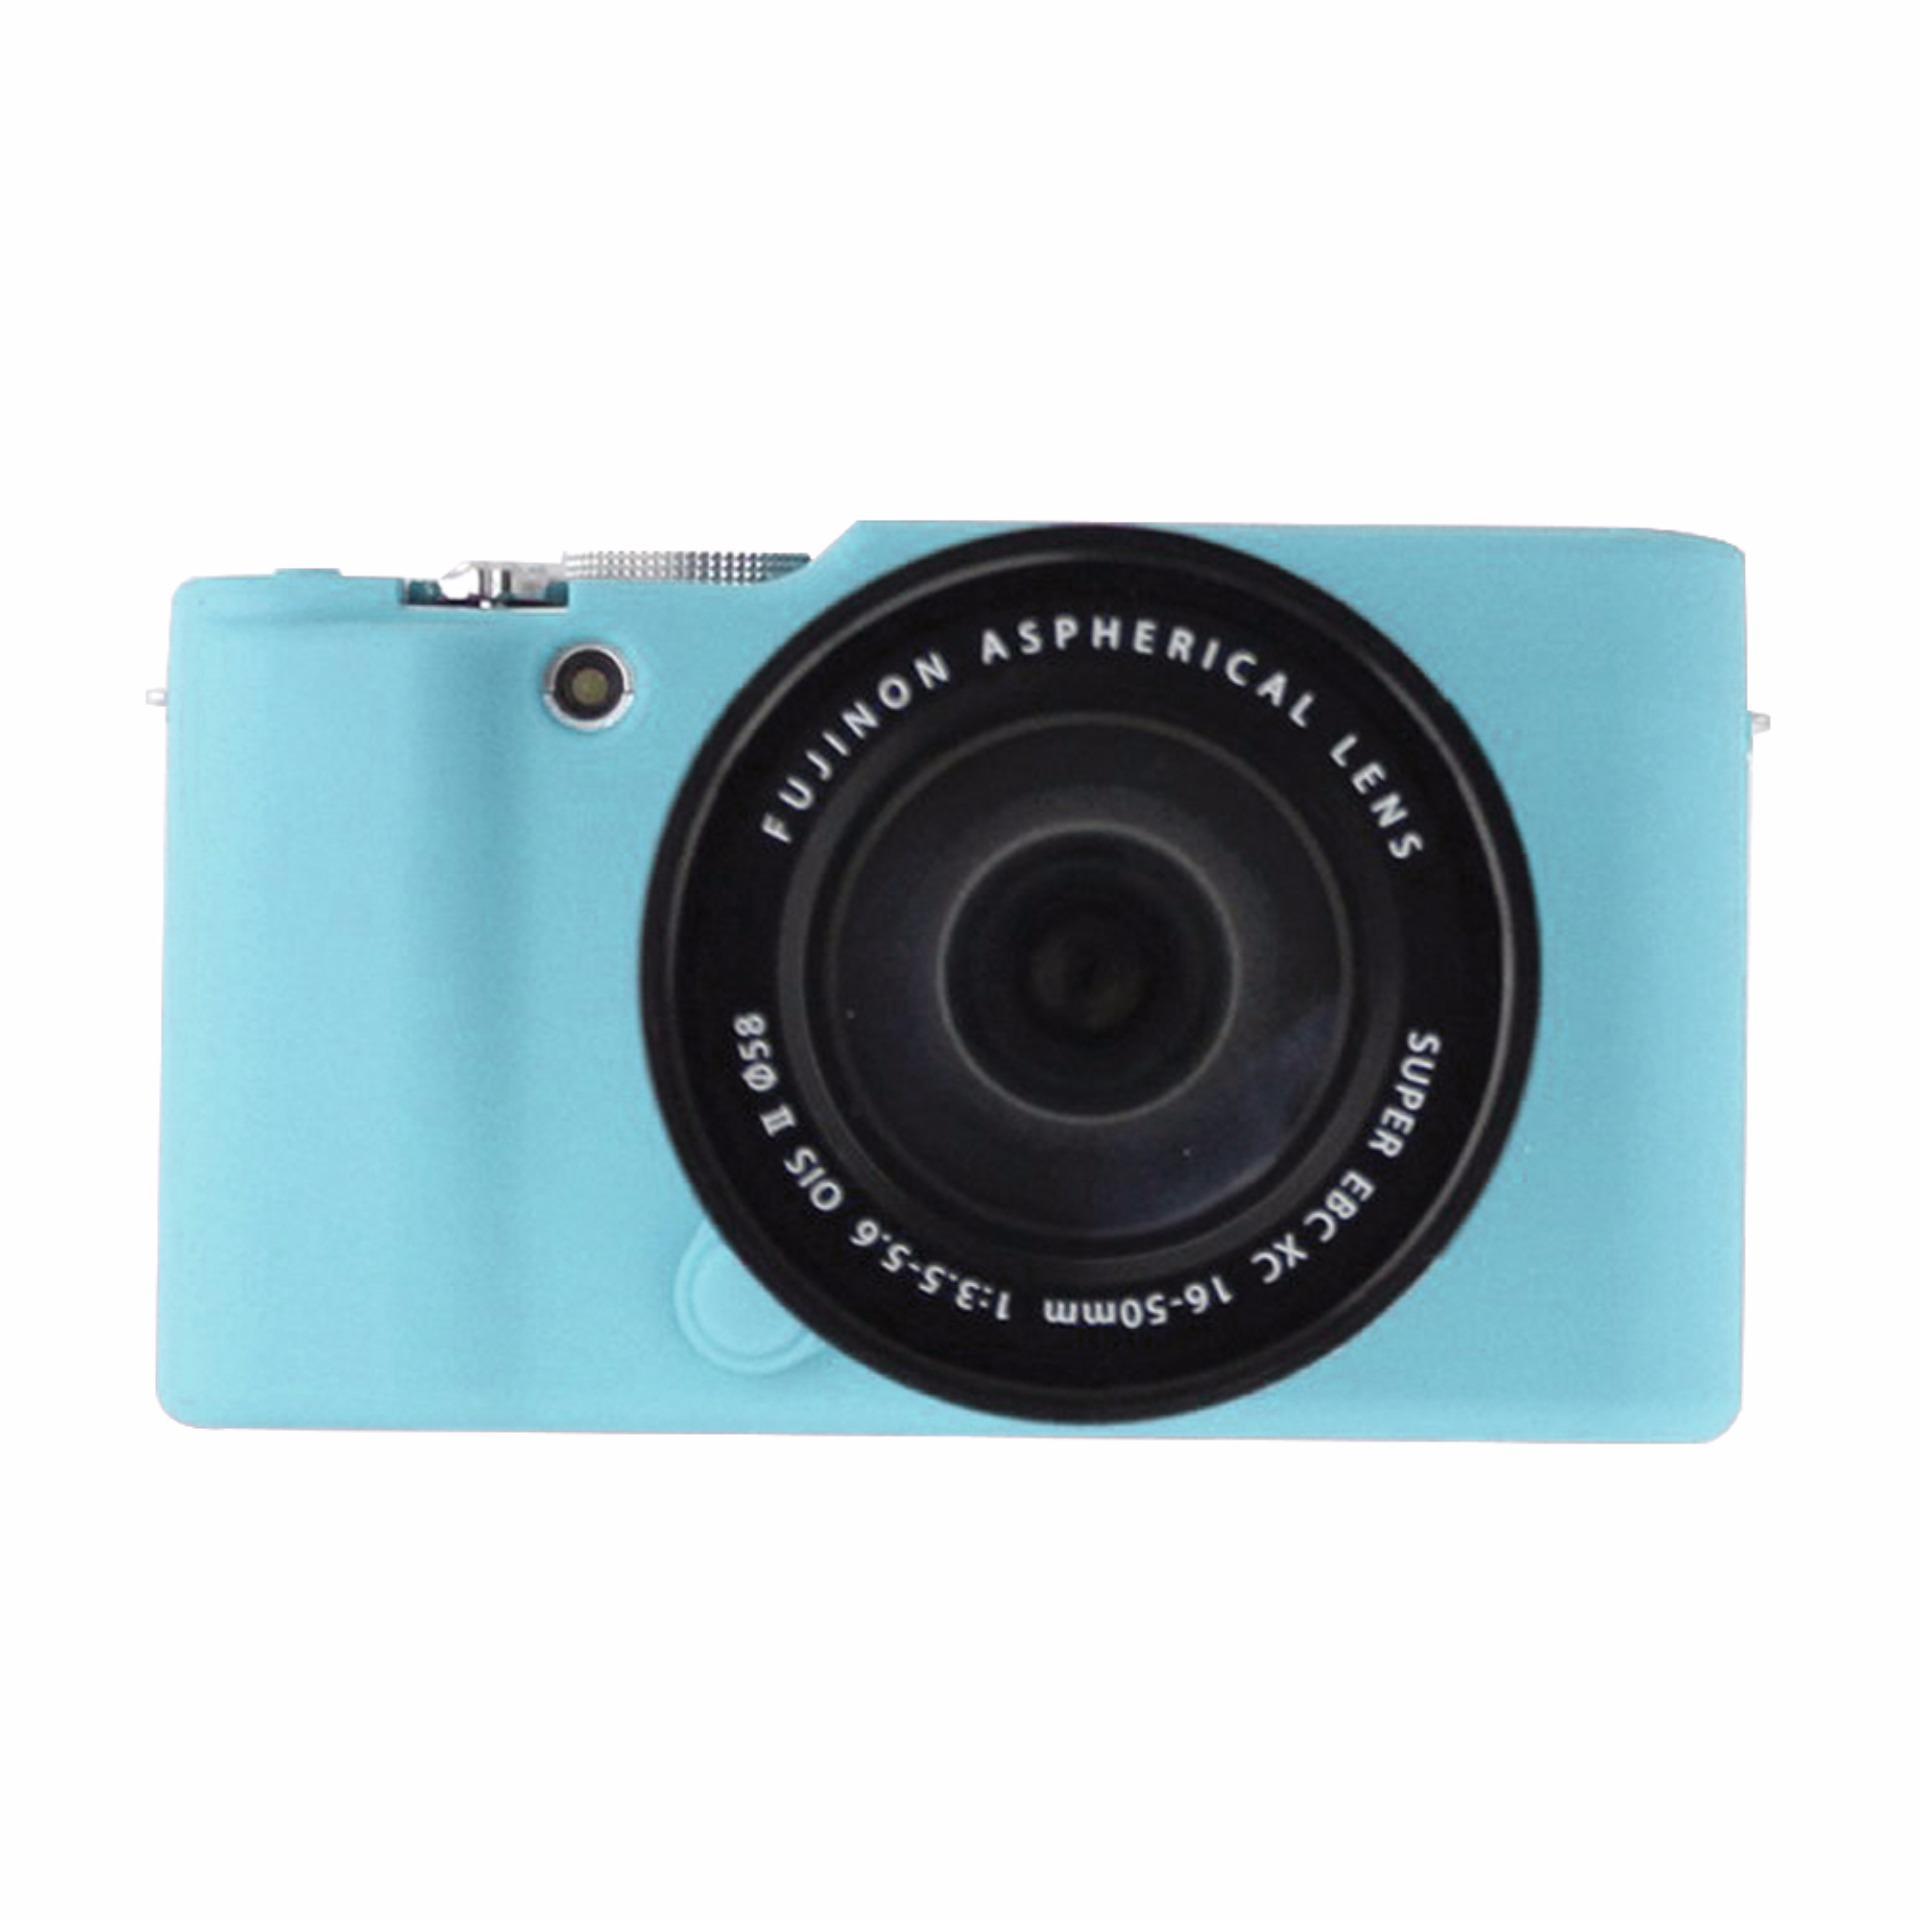 ... Fujifilm X-A2/X-A1/X-M1 Silicone Case/Sarung ...